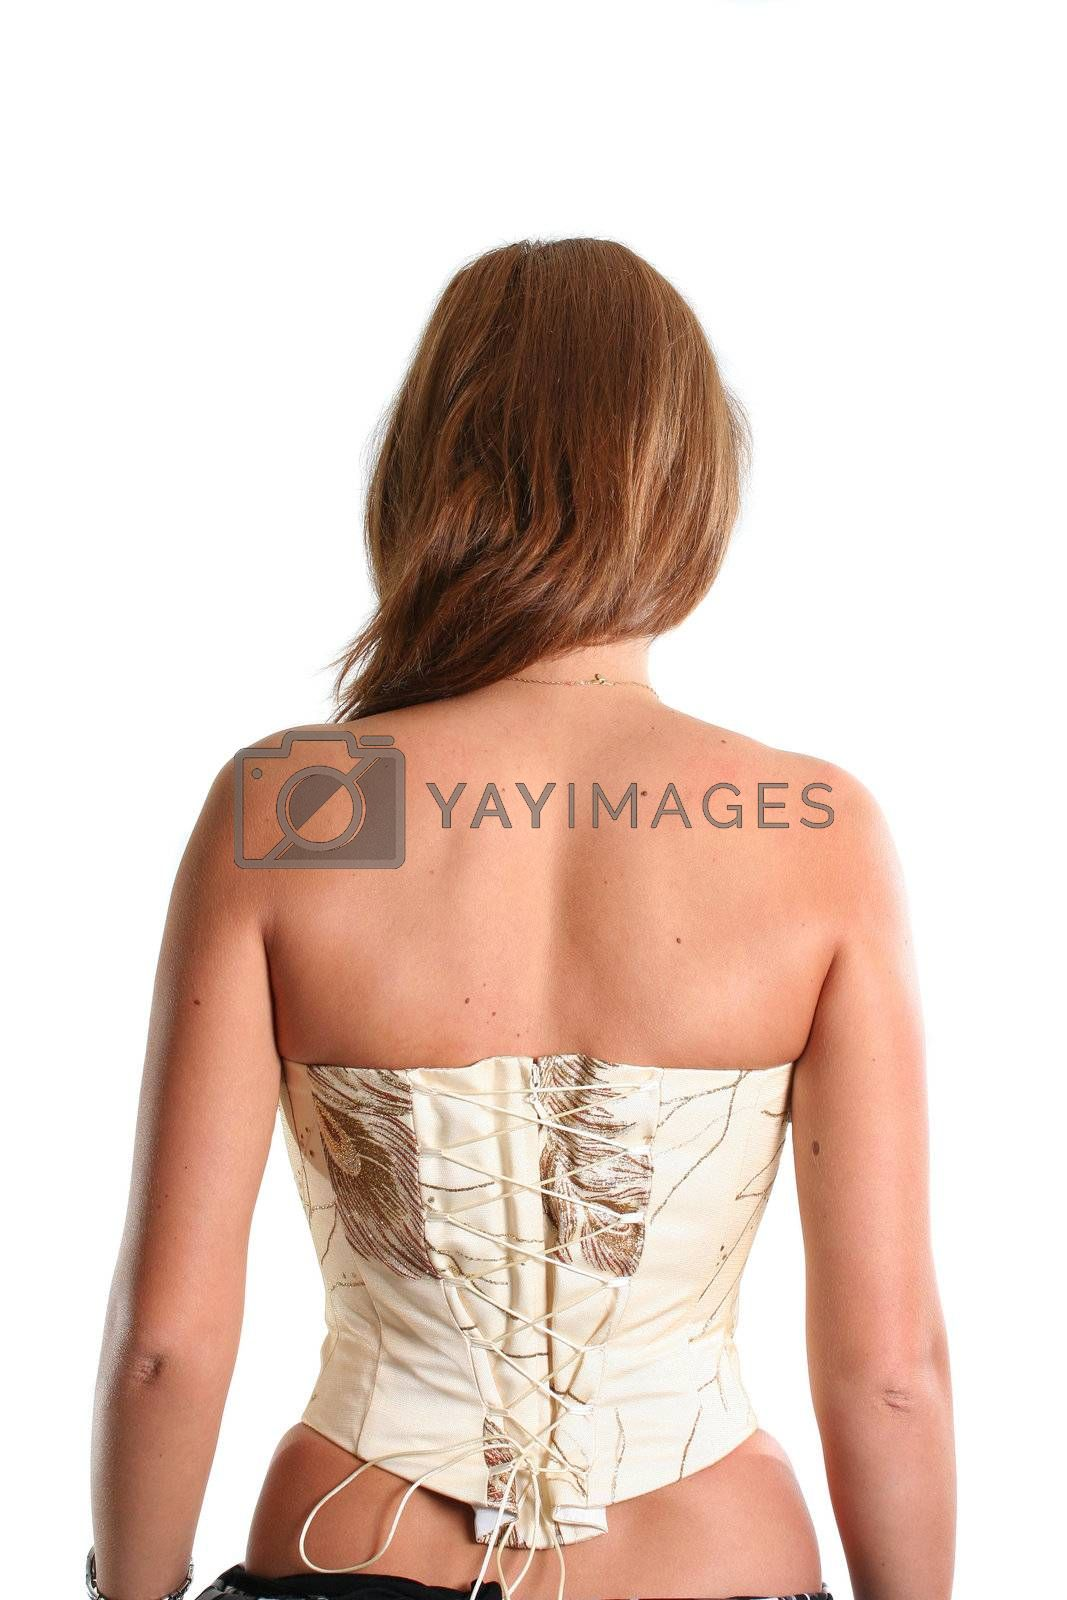 corset fetishes back slim abstract lingerie women